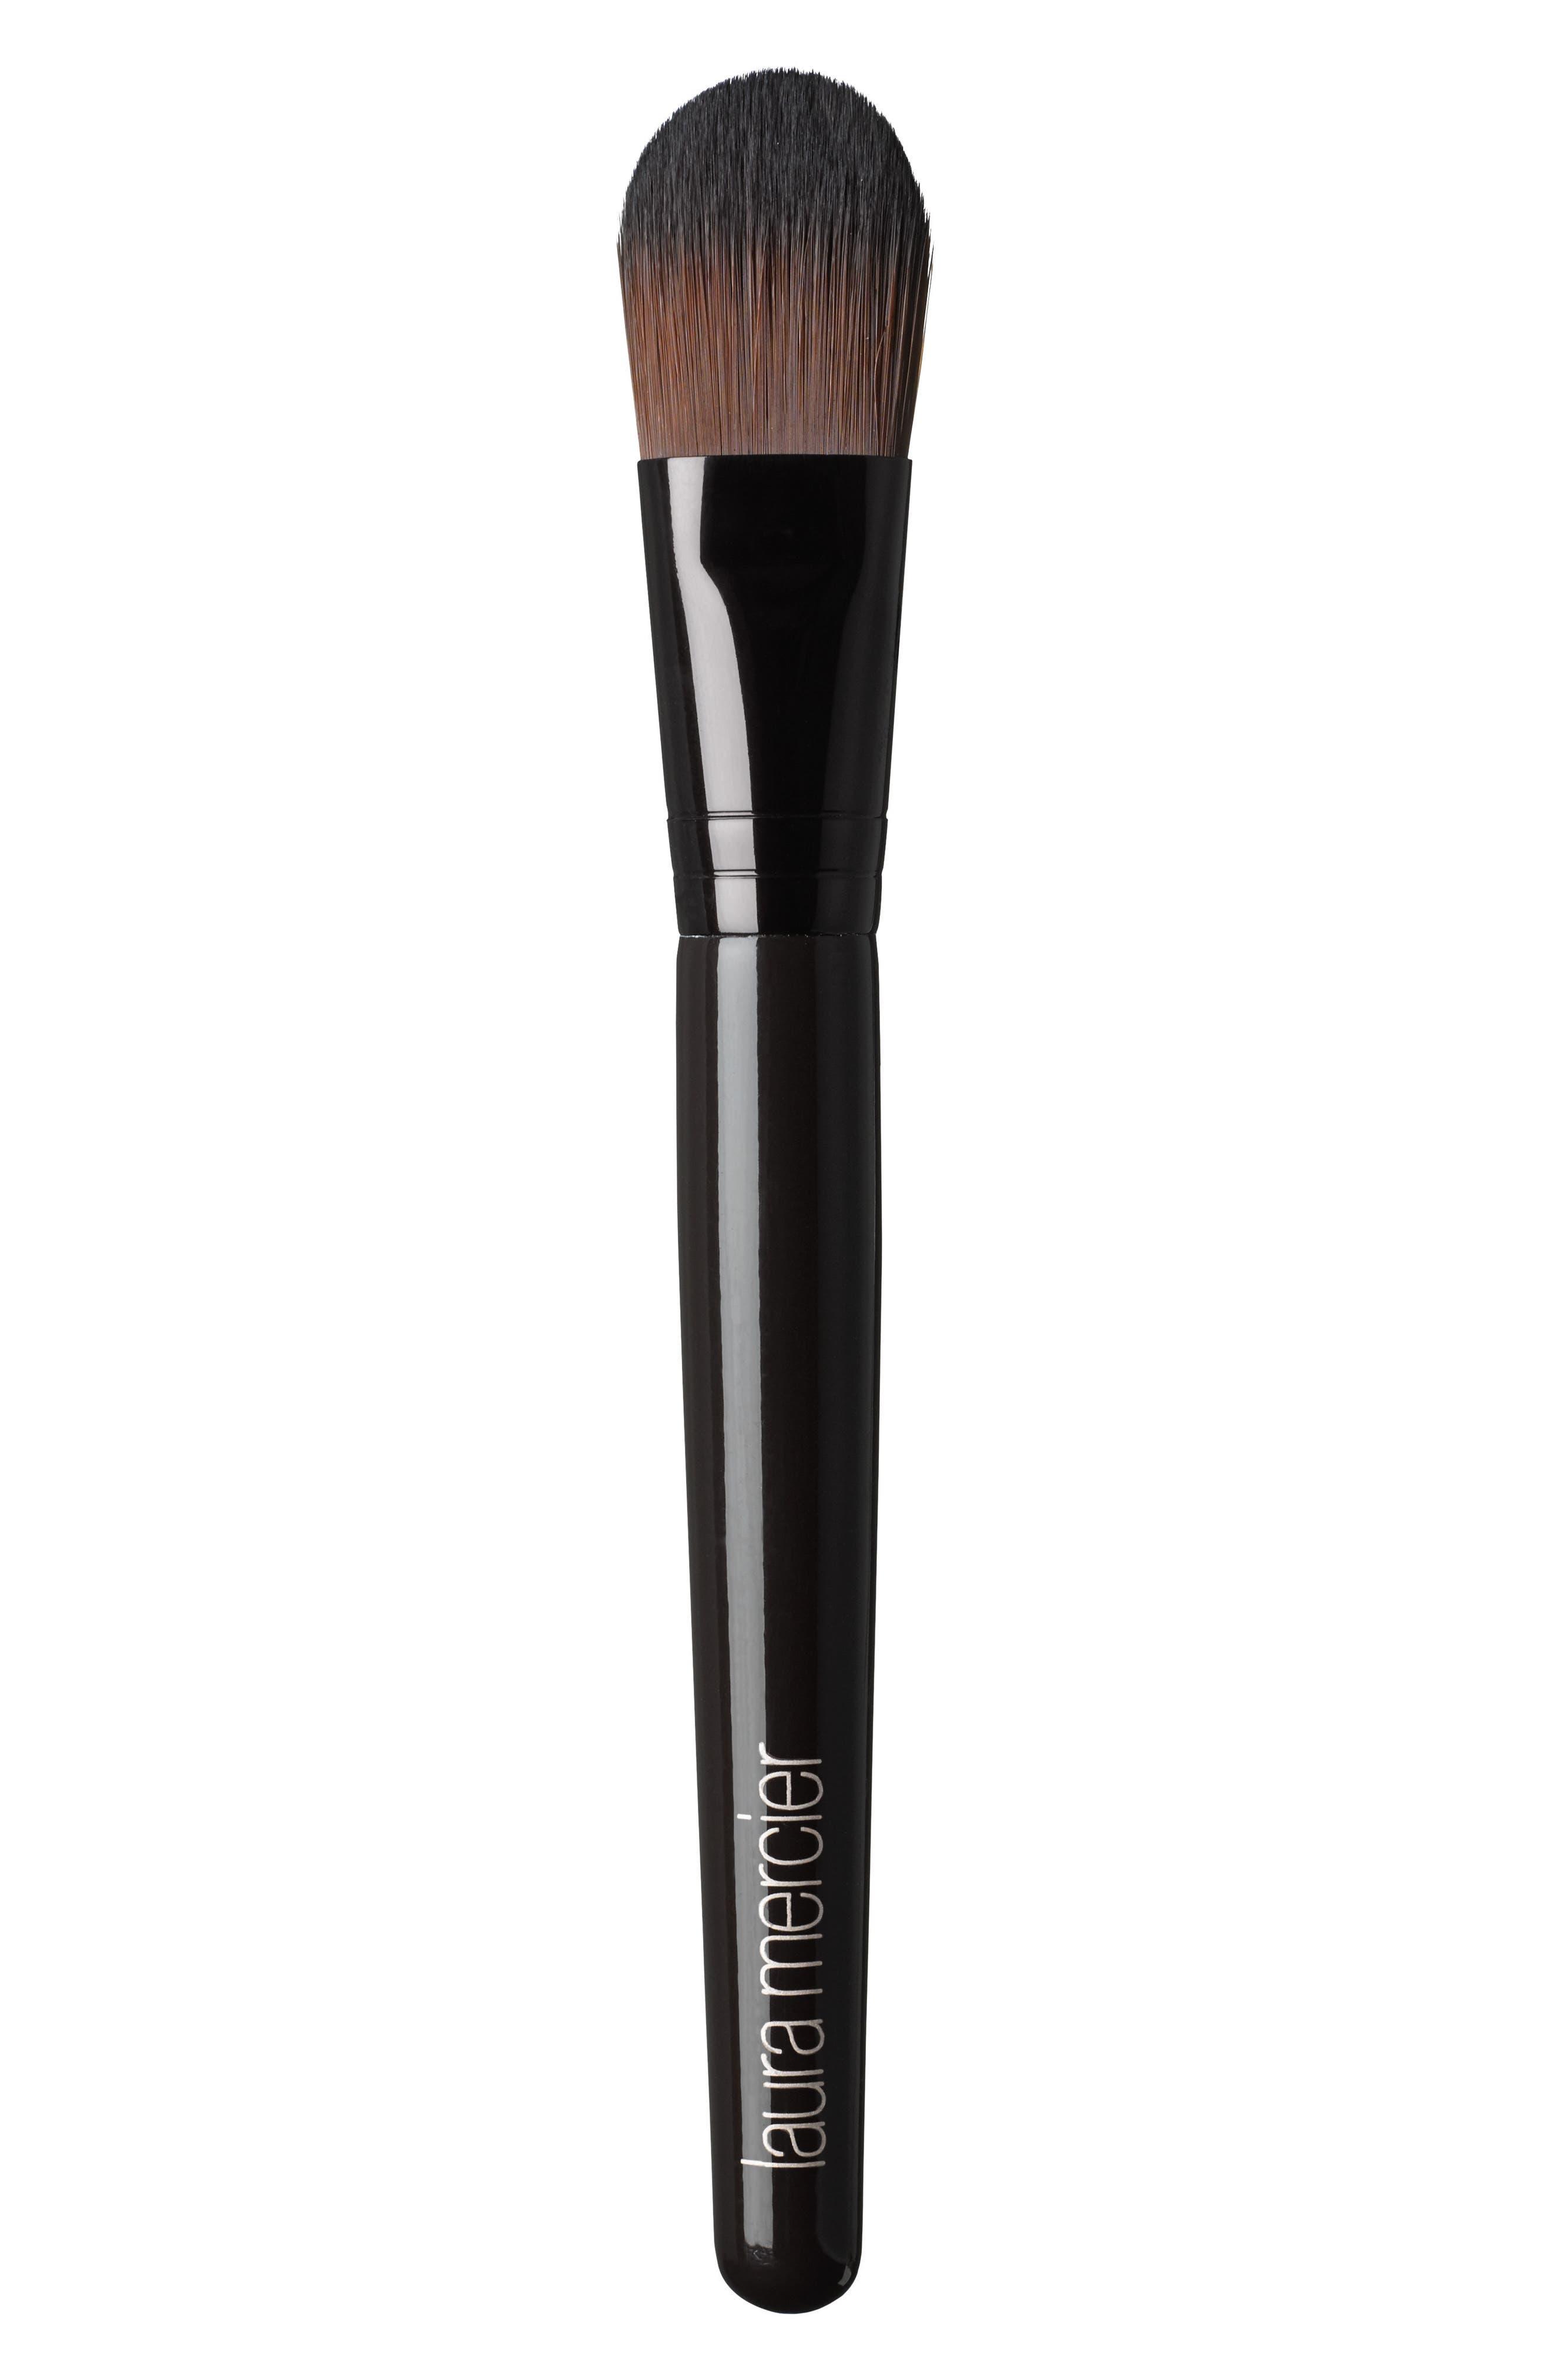 Laura Mercier Crème Cheek Color Brush